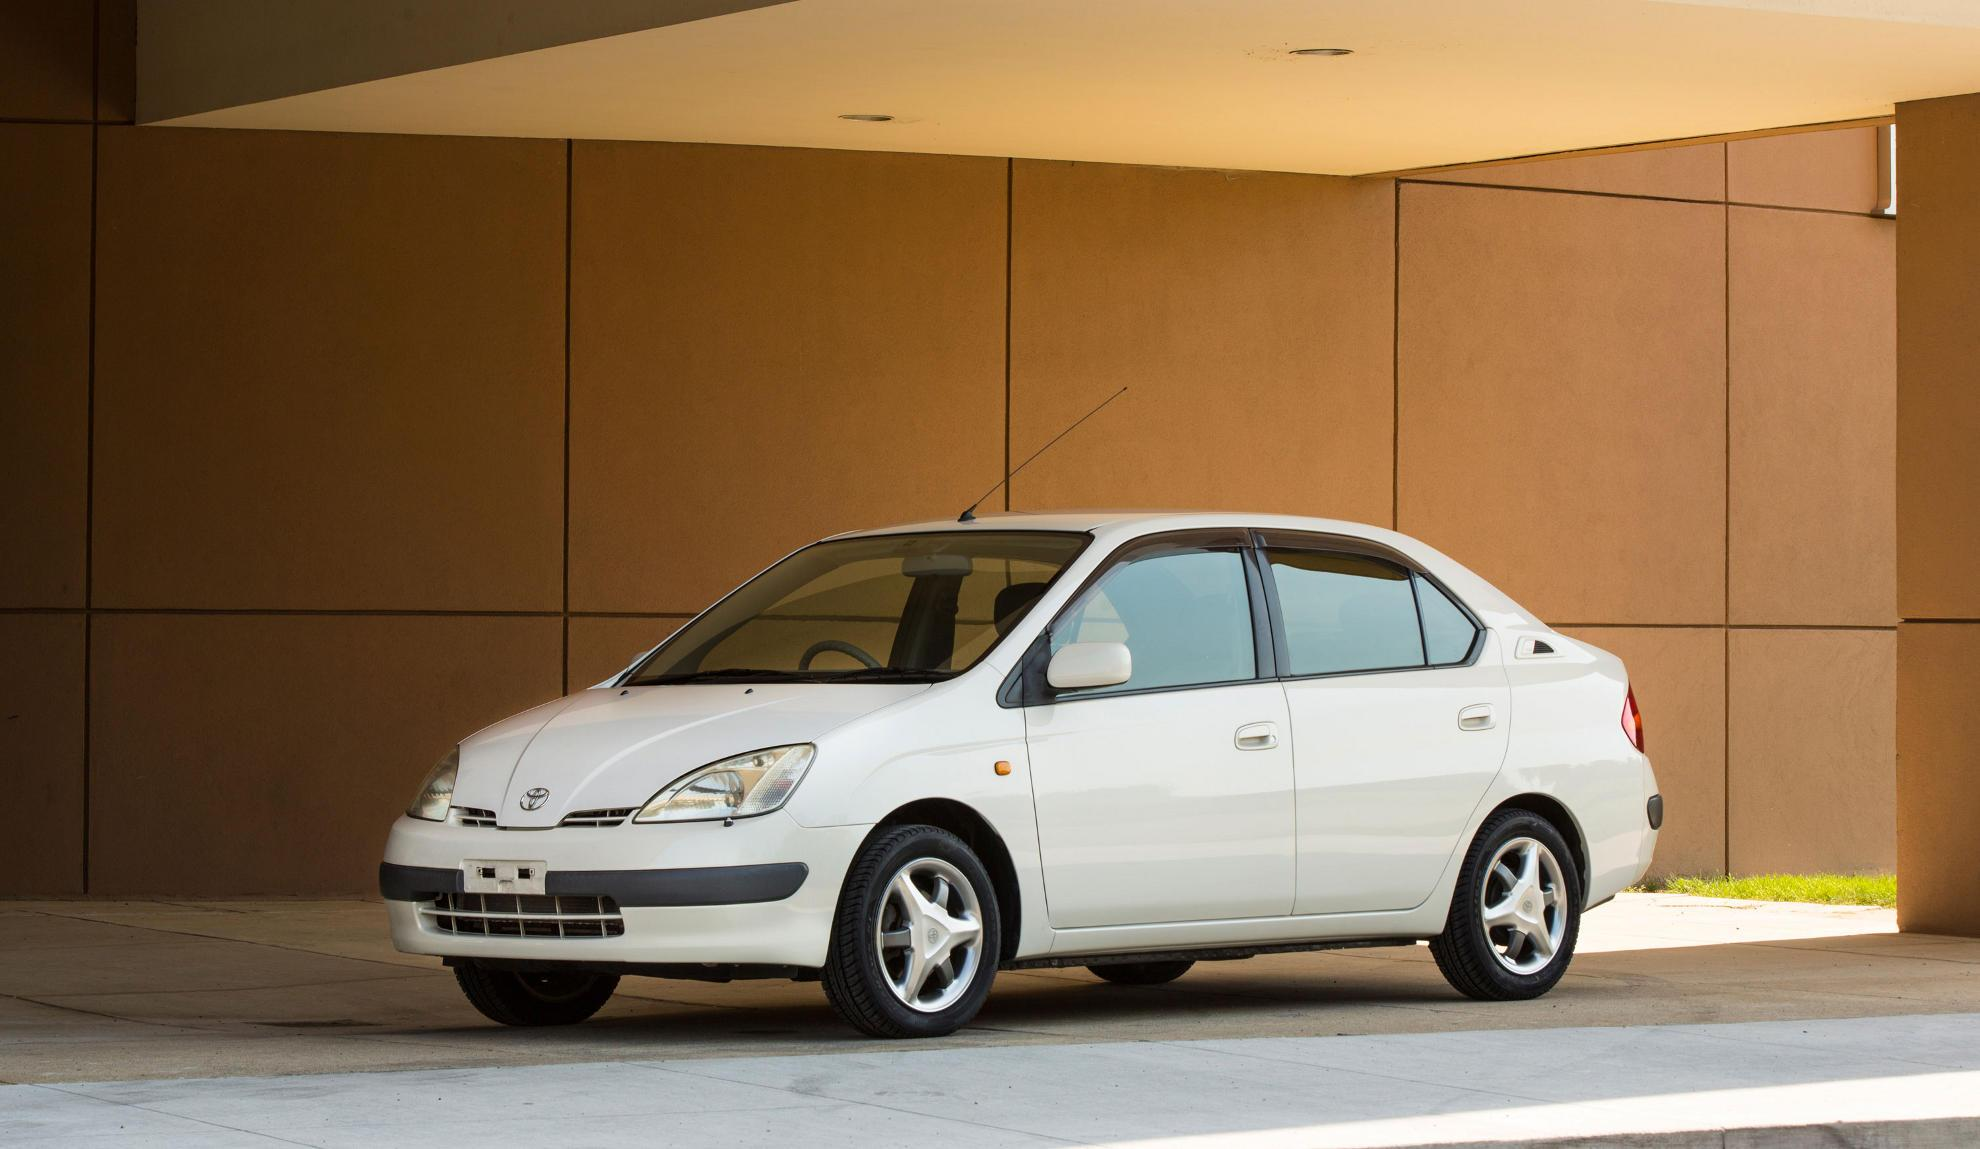 Toyota Hybrid 1997 Toyota Prius